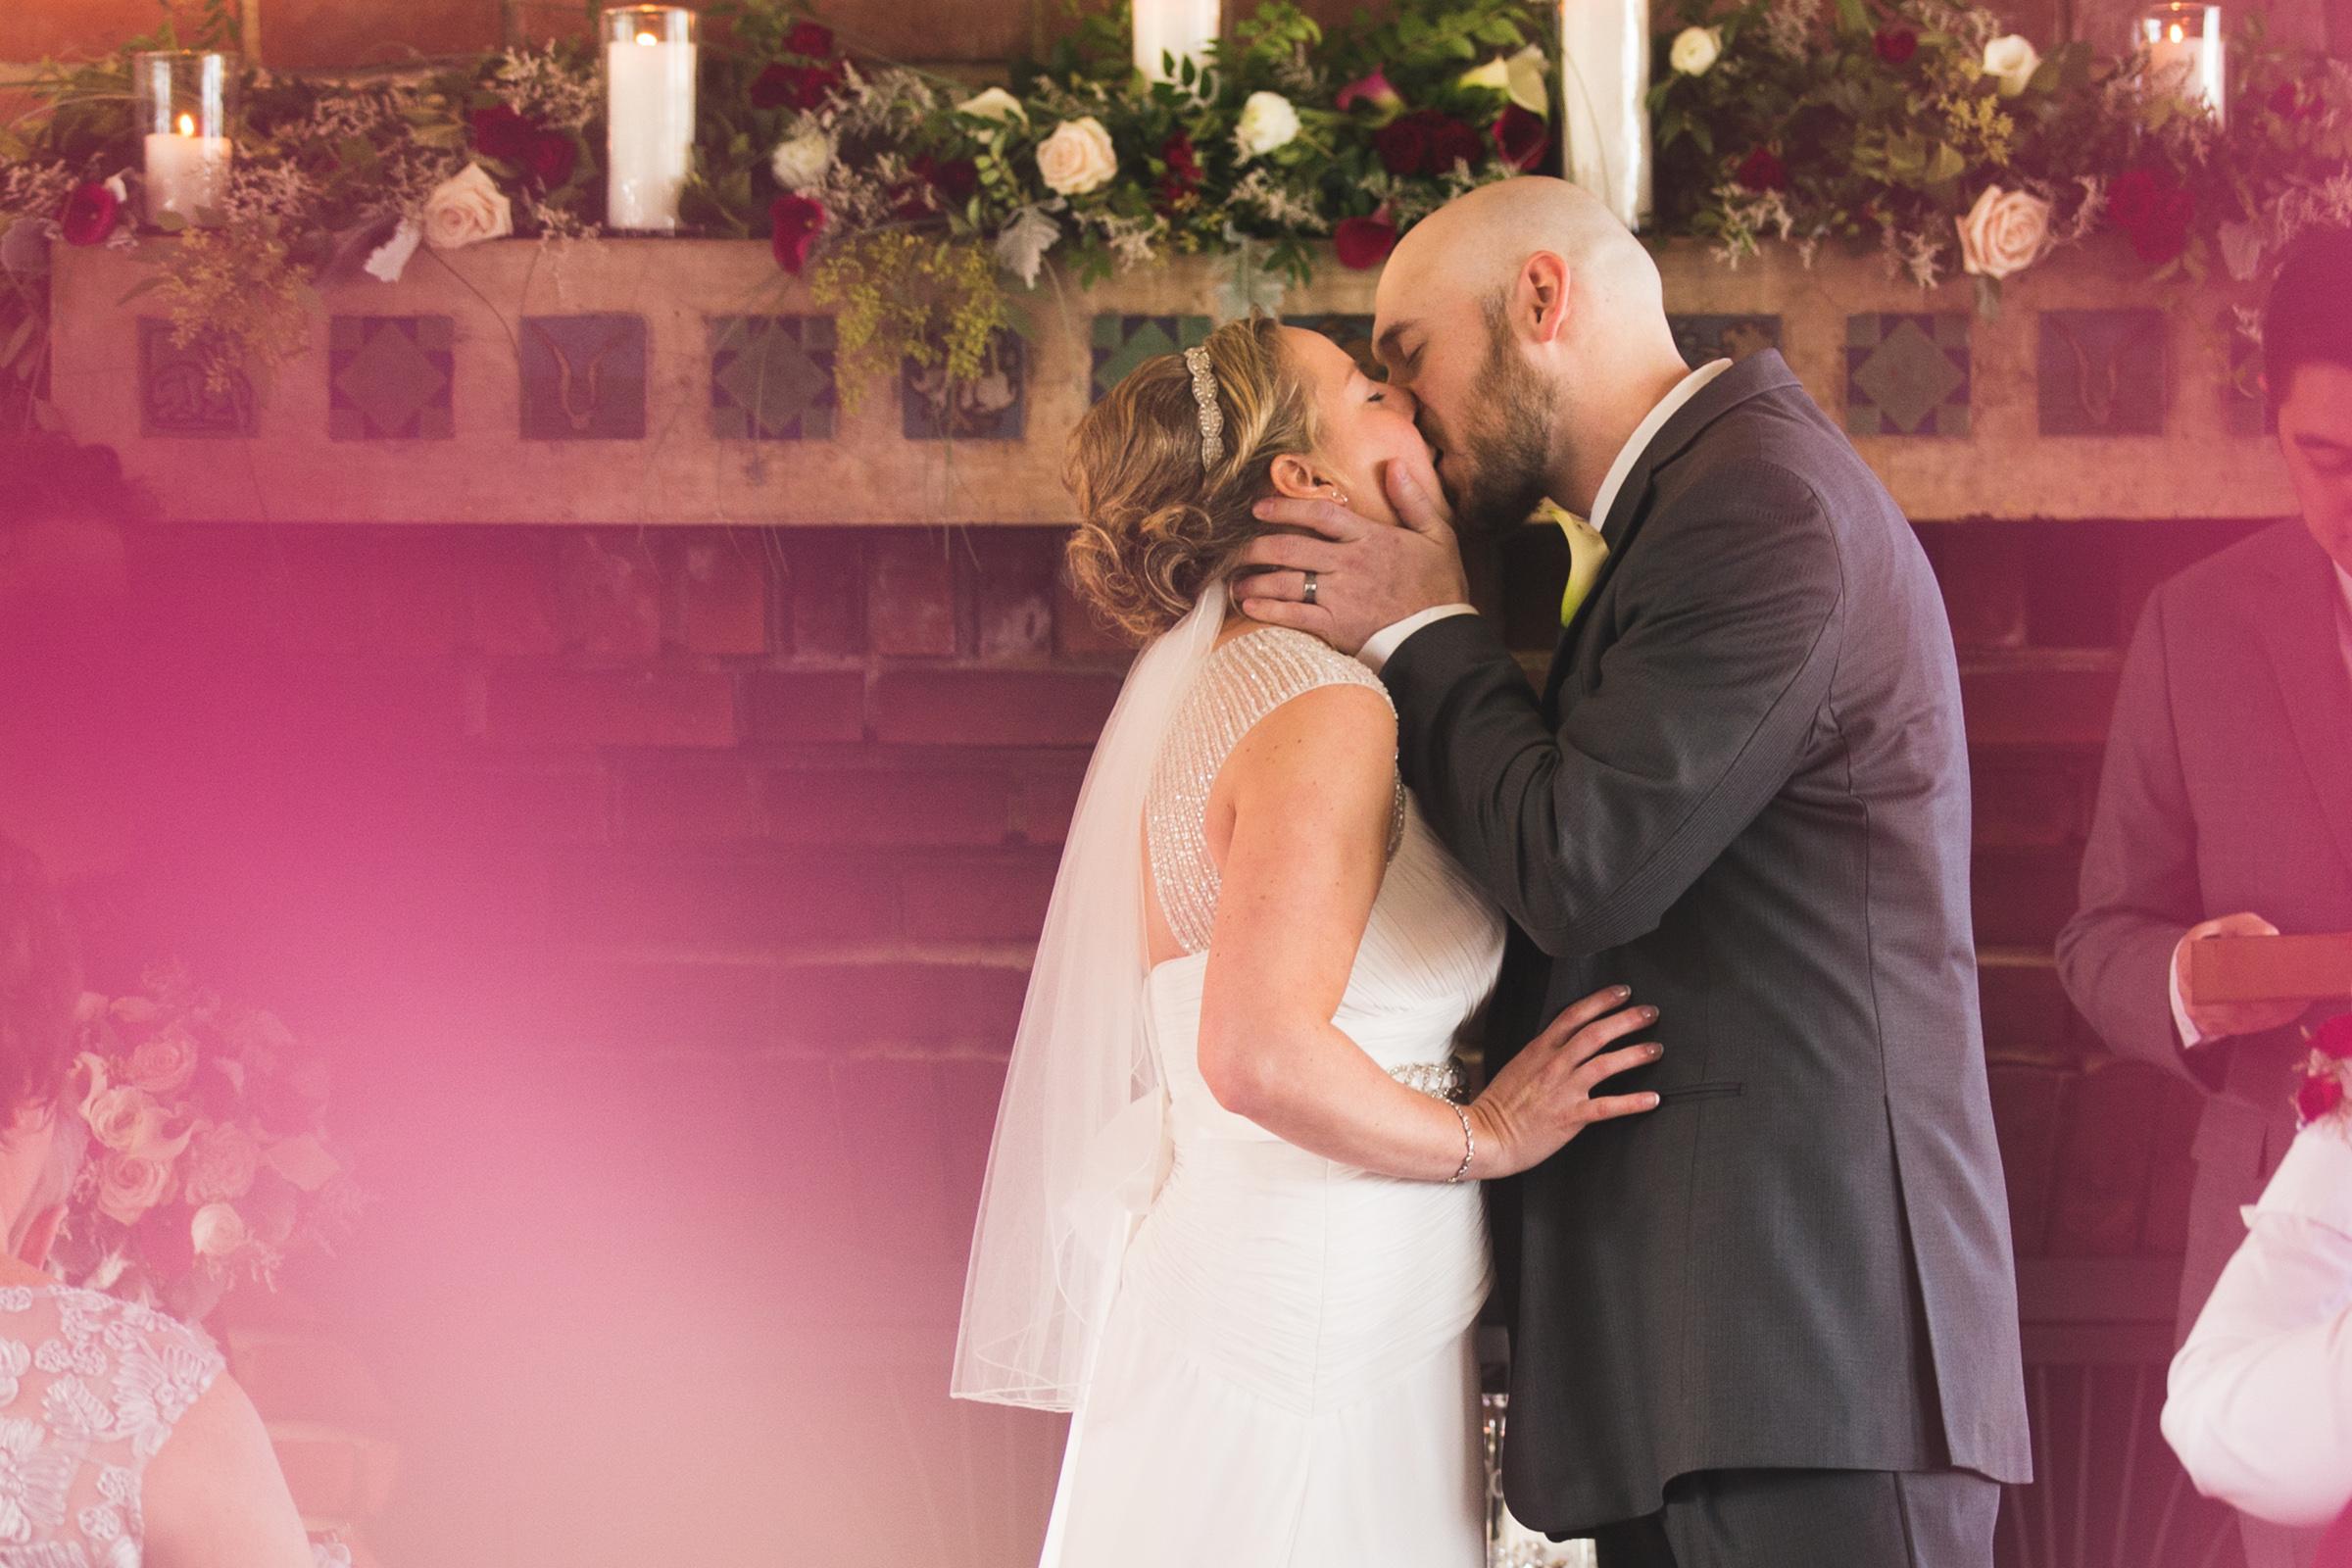 Liebe Photography Tacoma Wedding Photographer Jeff And Julie 47 2